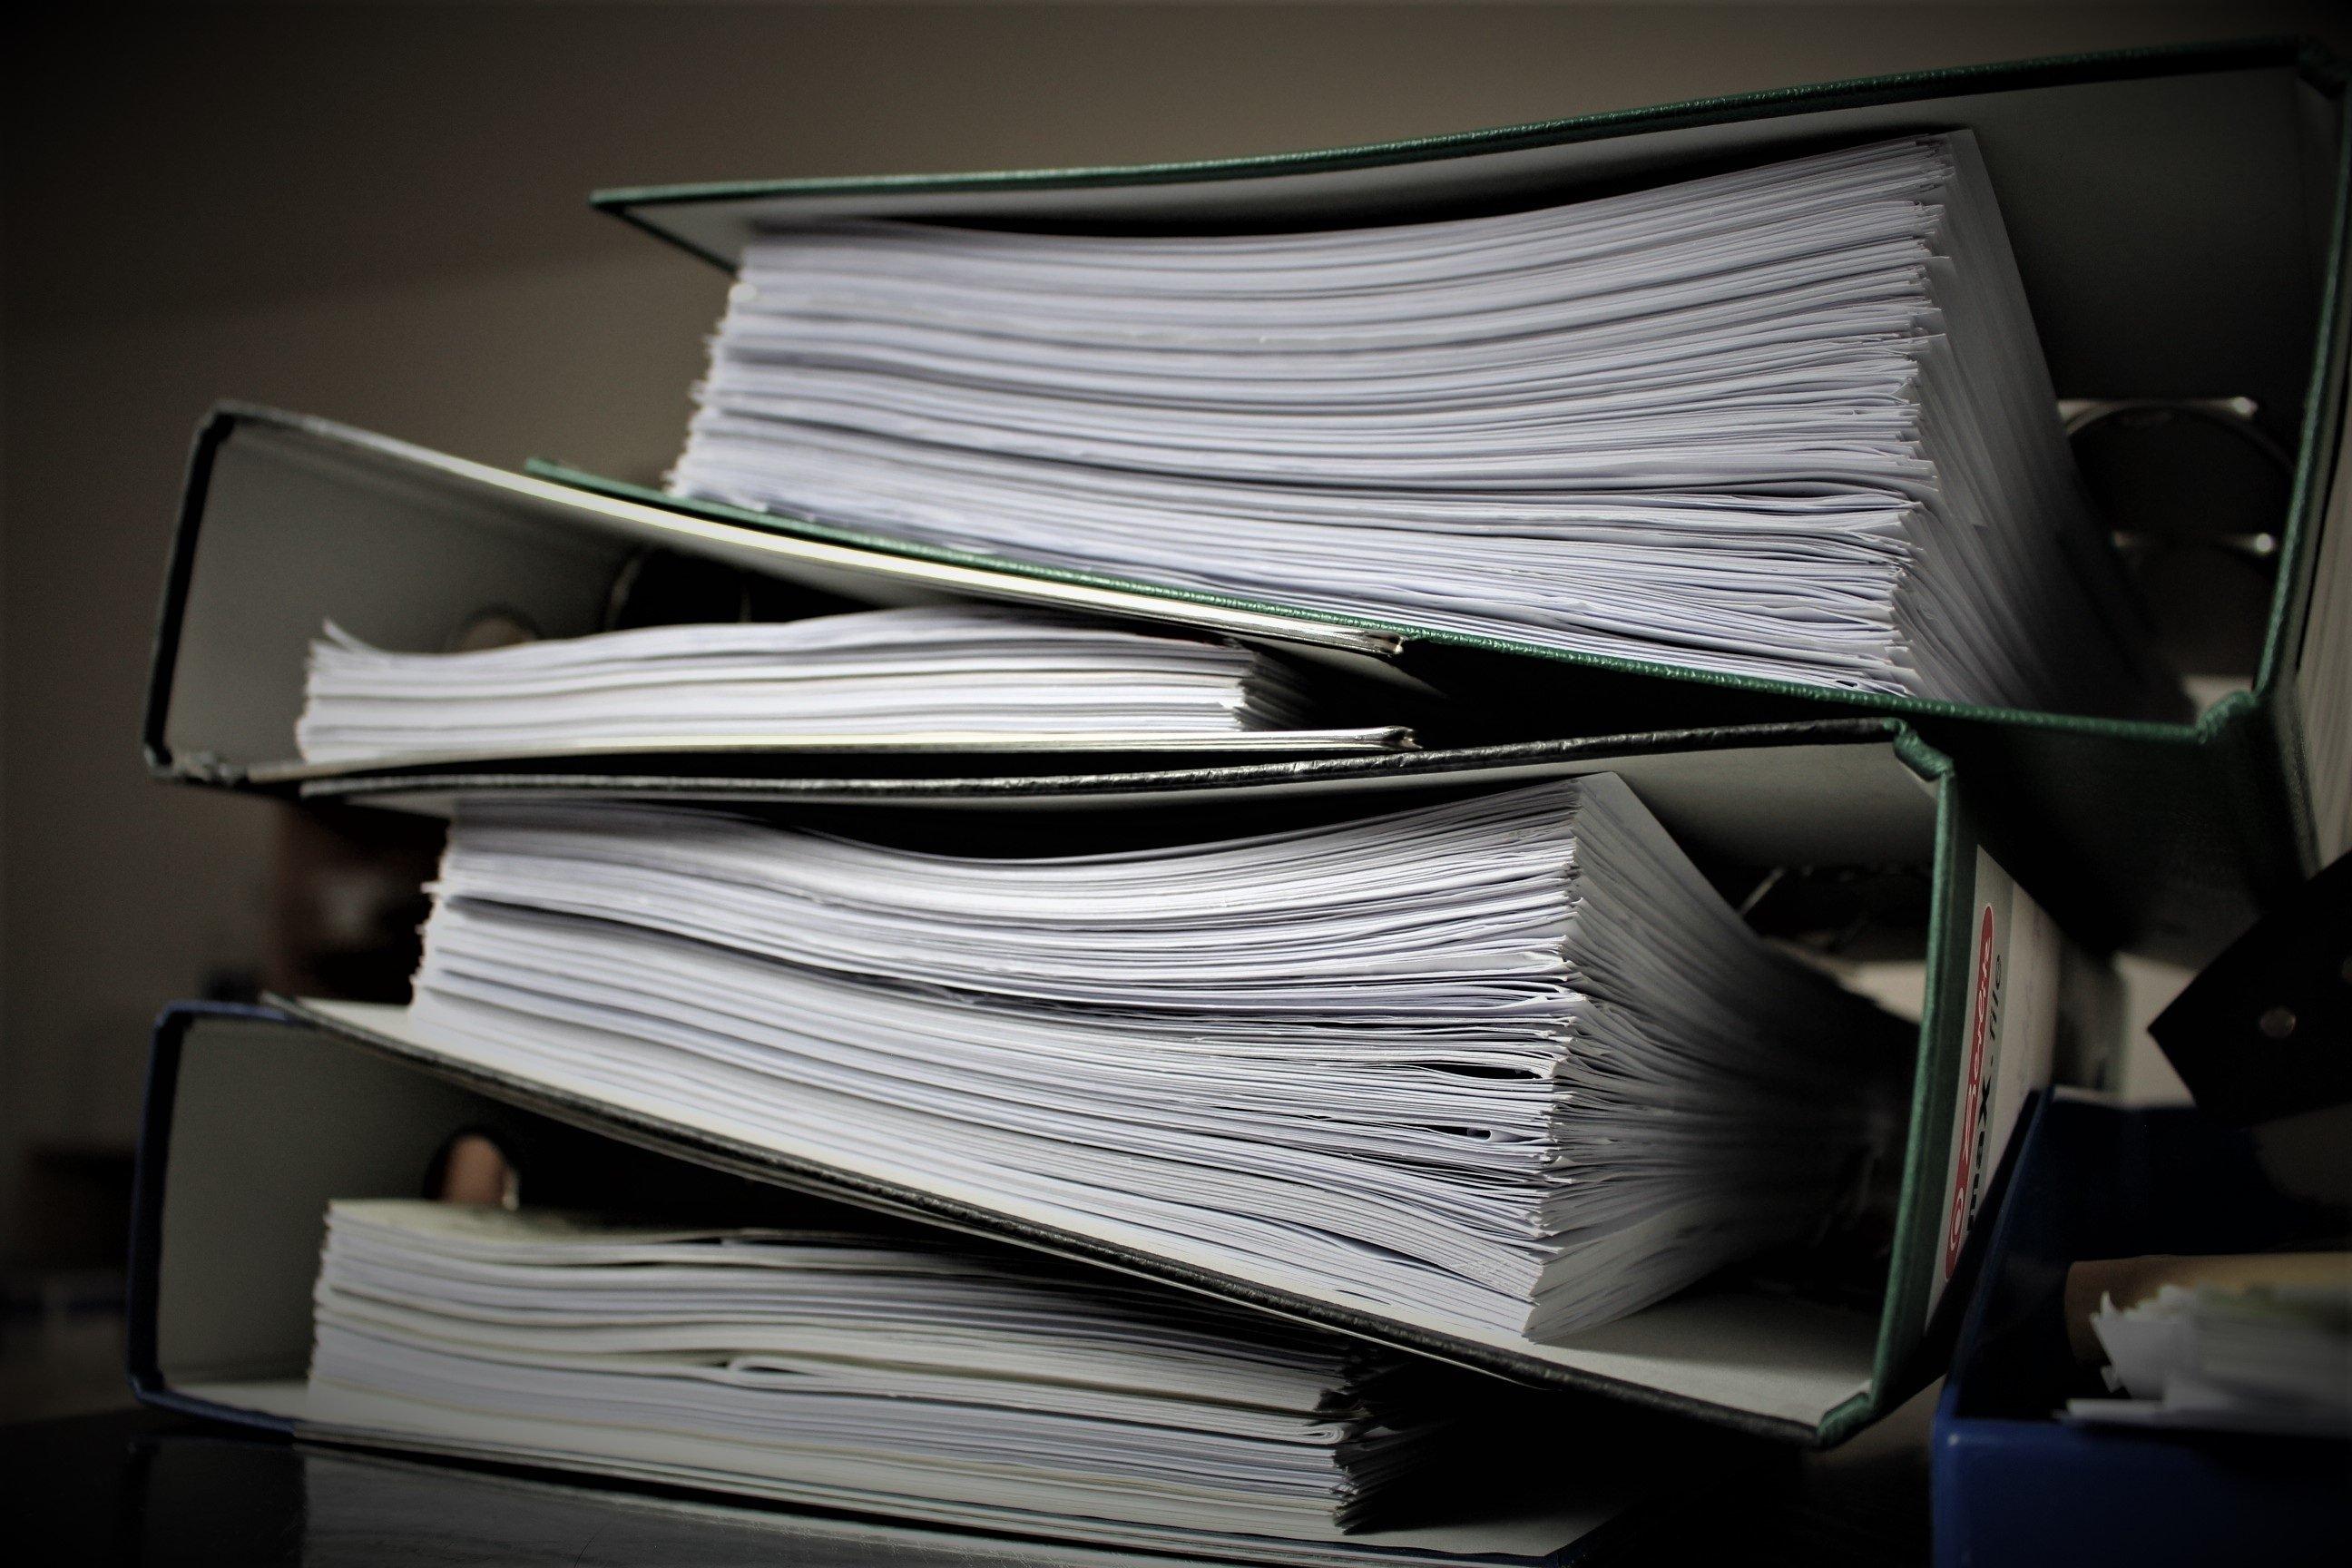 Pile of Folders